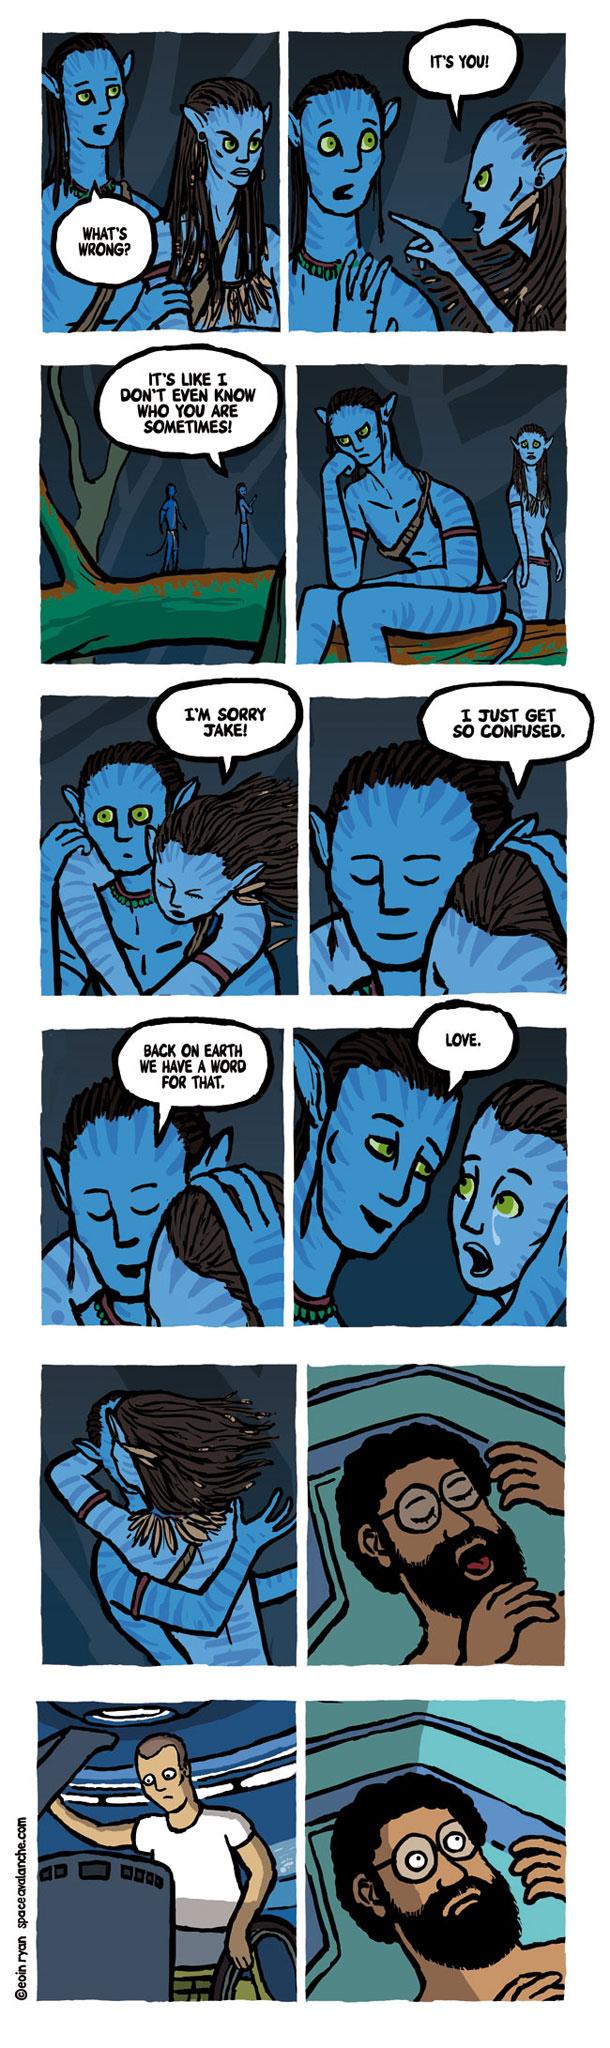 Avatar's Most Awkward Deleted Scene [COMIC]